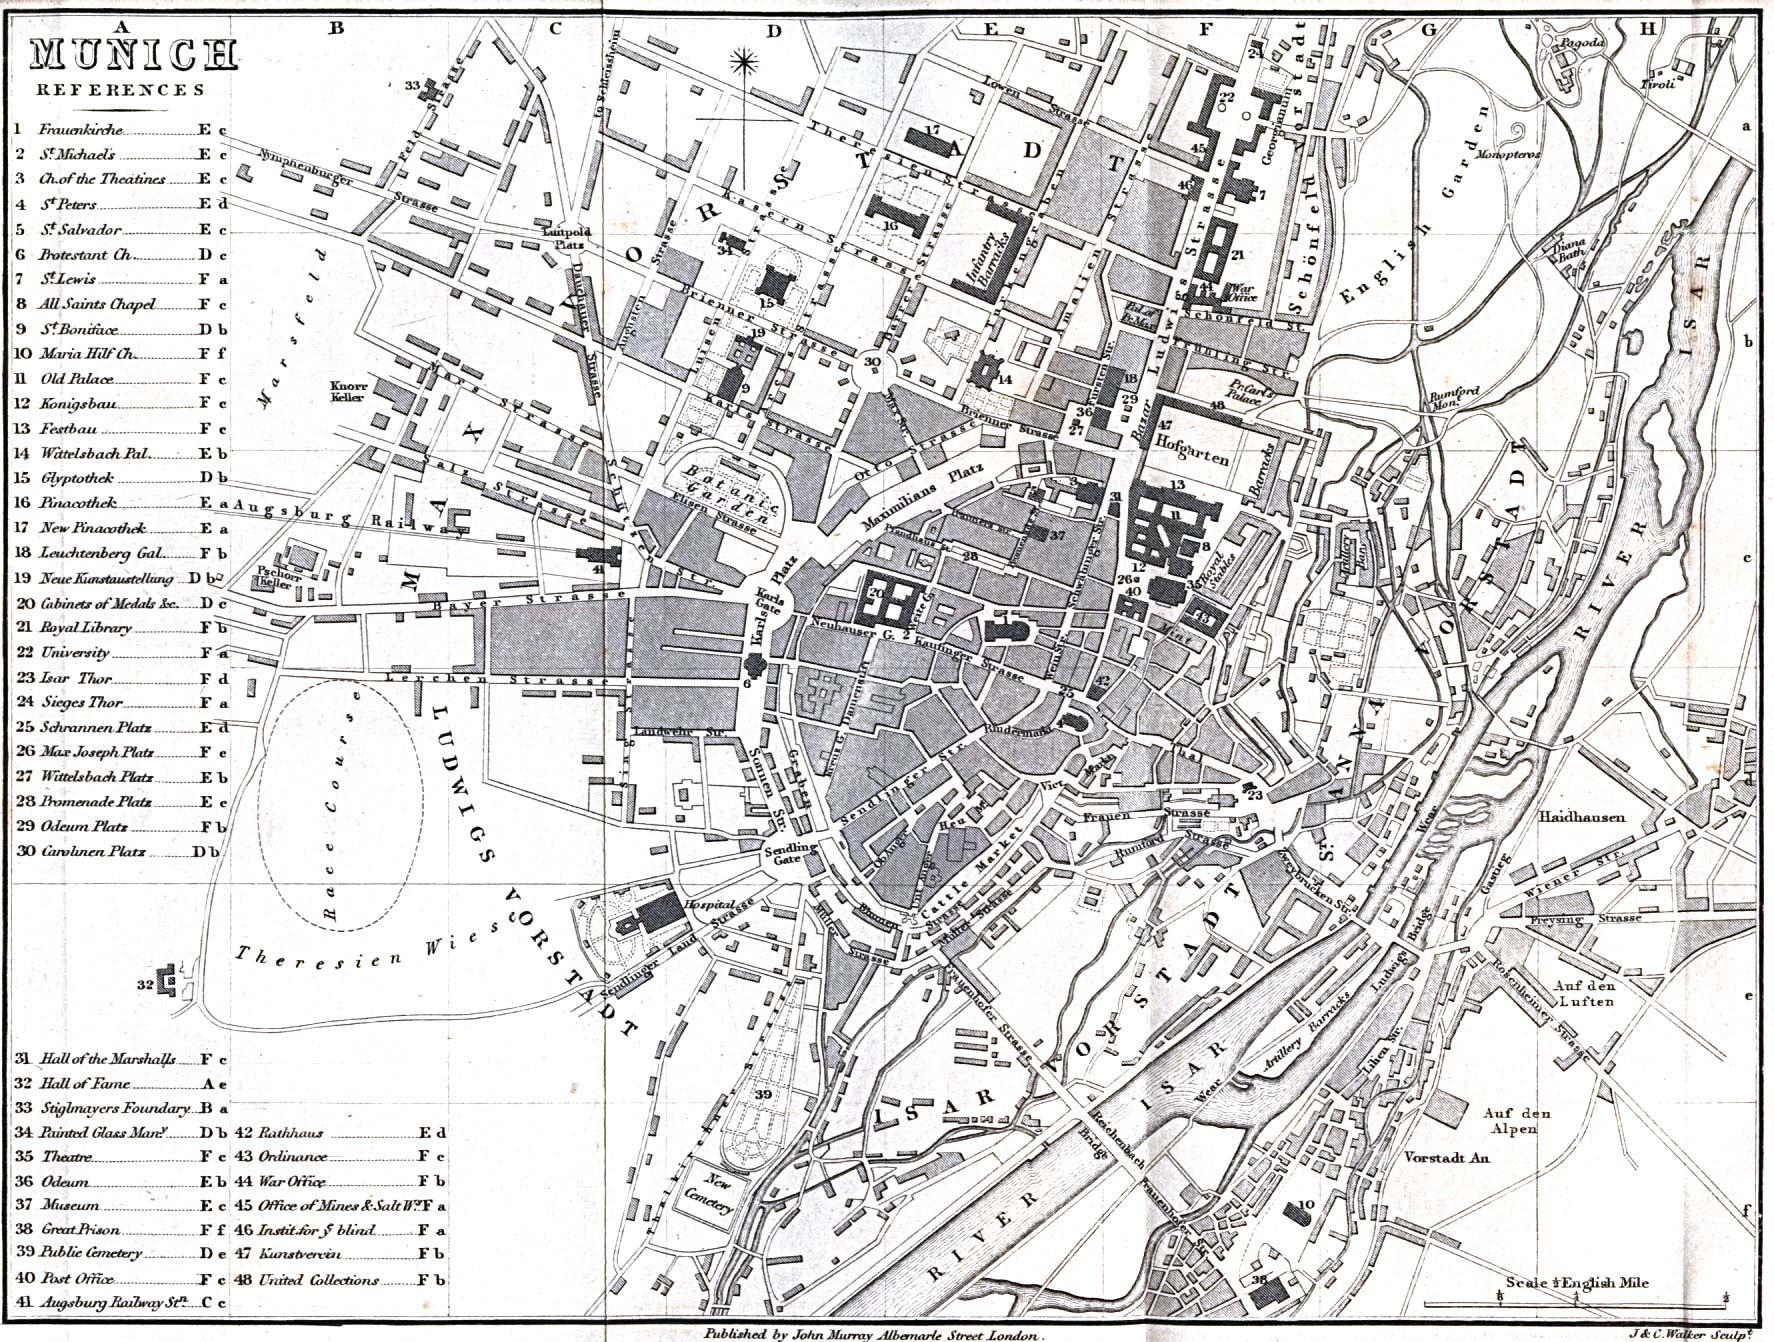 Munich 1858 Throw Off The Bowlines Pinterest Munich and Bavaria